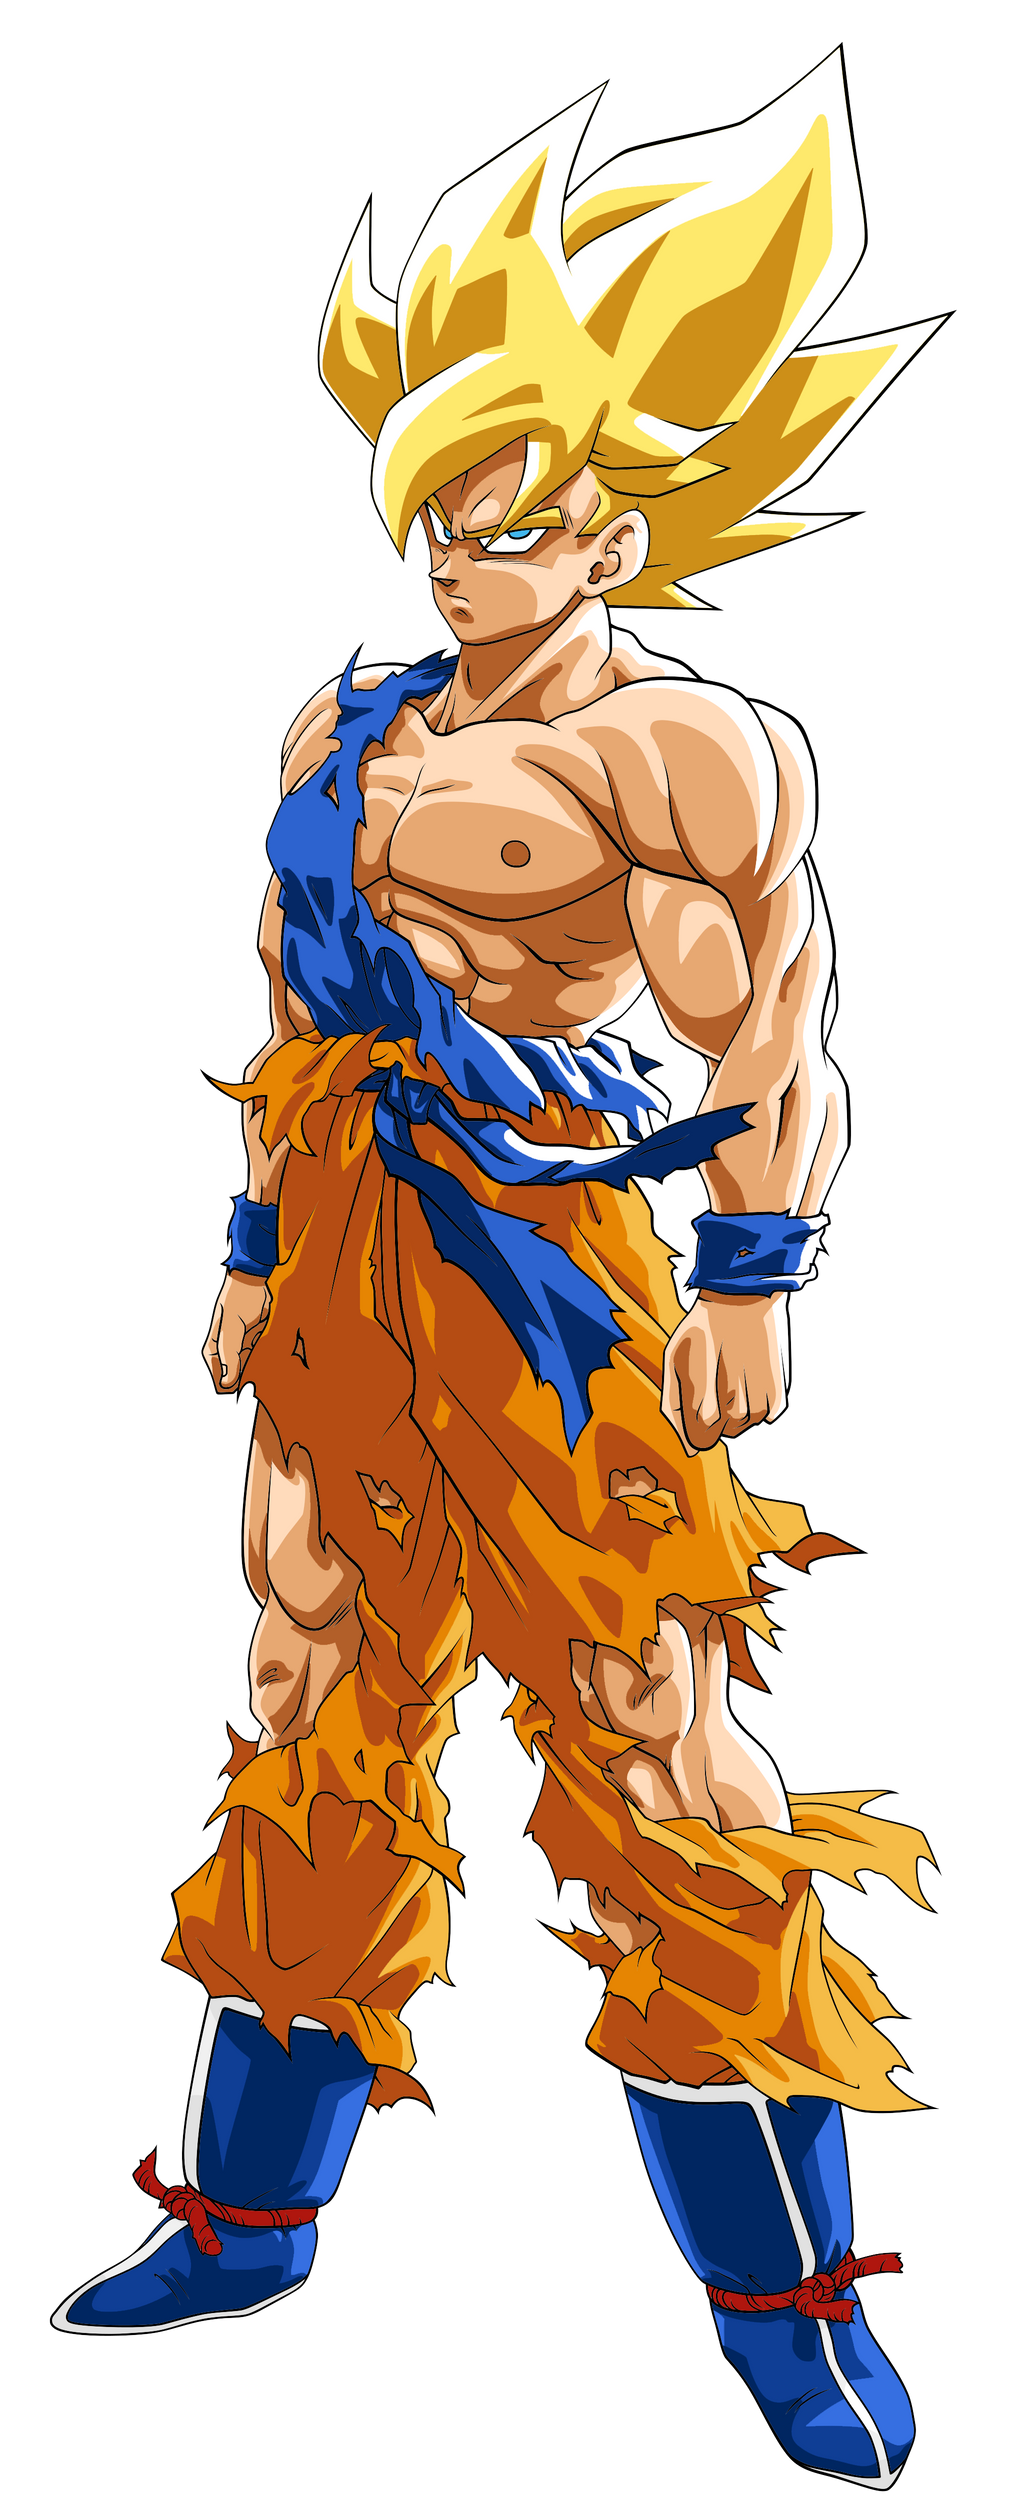 Goku Ssj Namek Ssj Full Color Palette By Benj San On Deviantart Dragon Ball Super Manga Anime Dragon Ball Goku Dragon Ball Painting